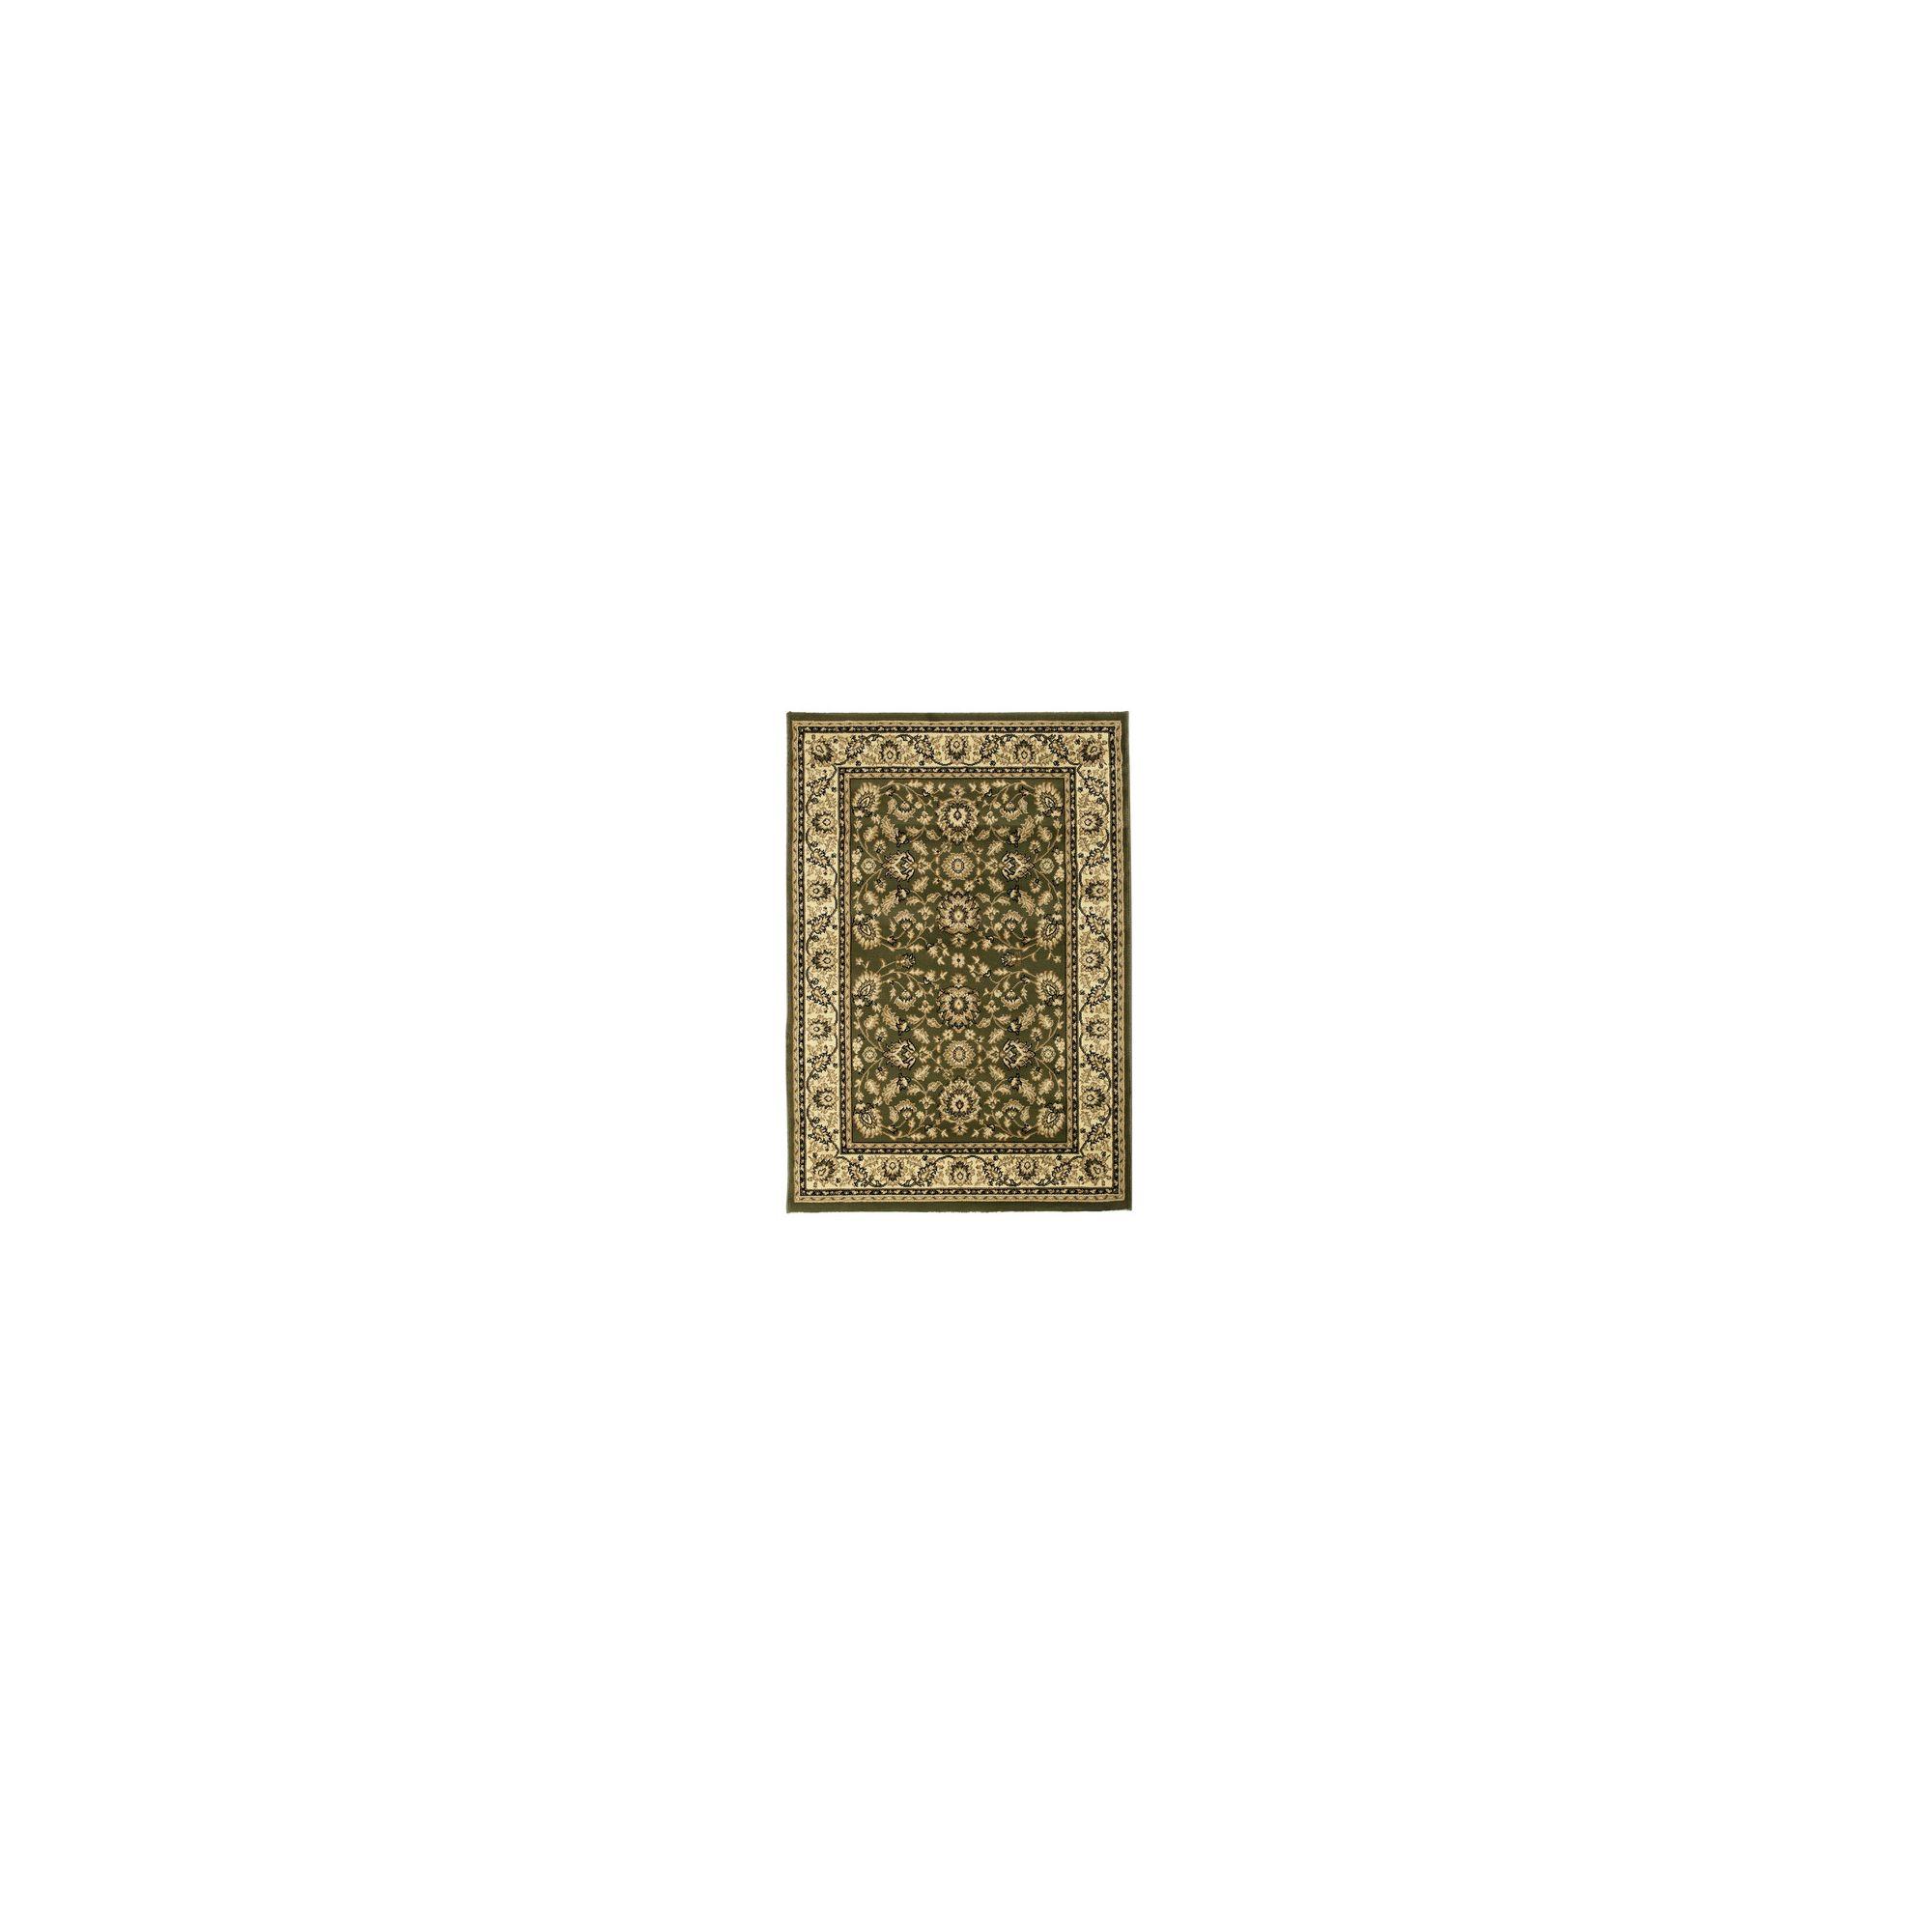 Oriental Carpets & Rugs Heritage 0993A Green Rug - Runner 67cm x 240cm